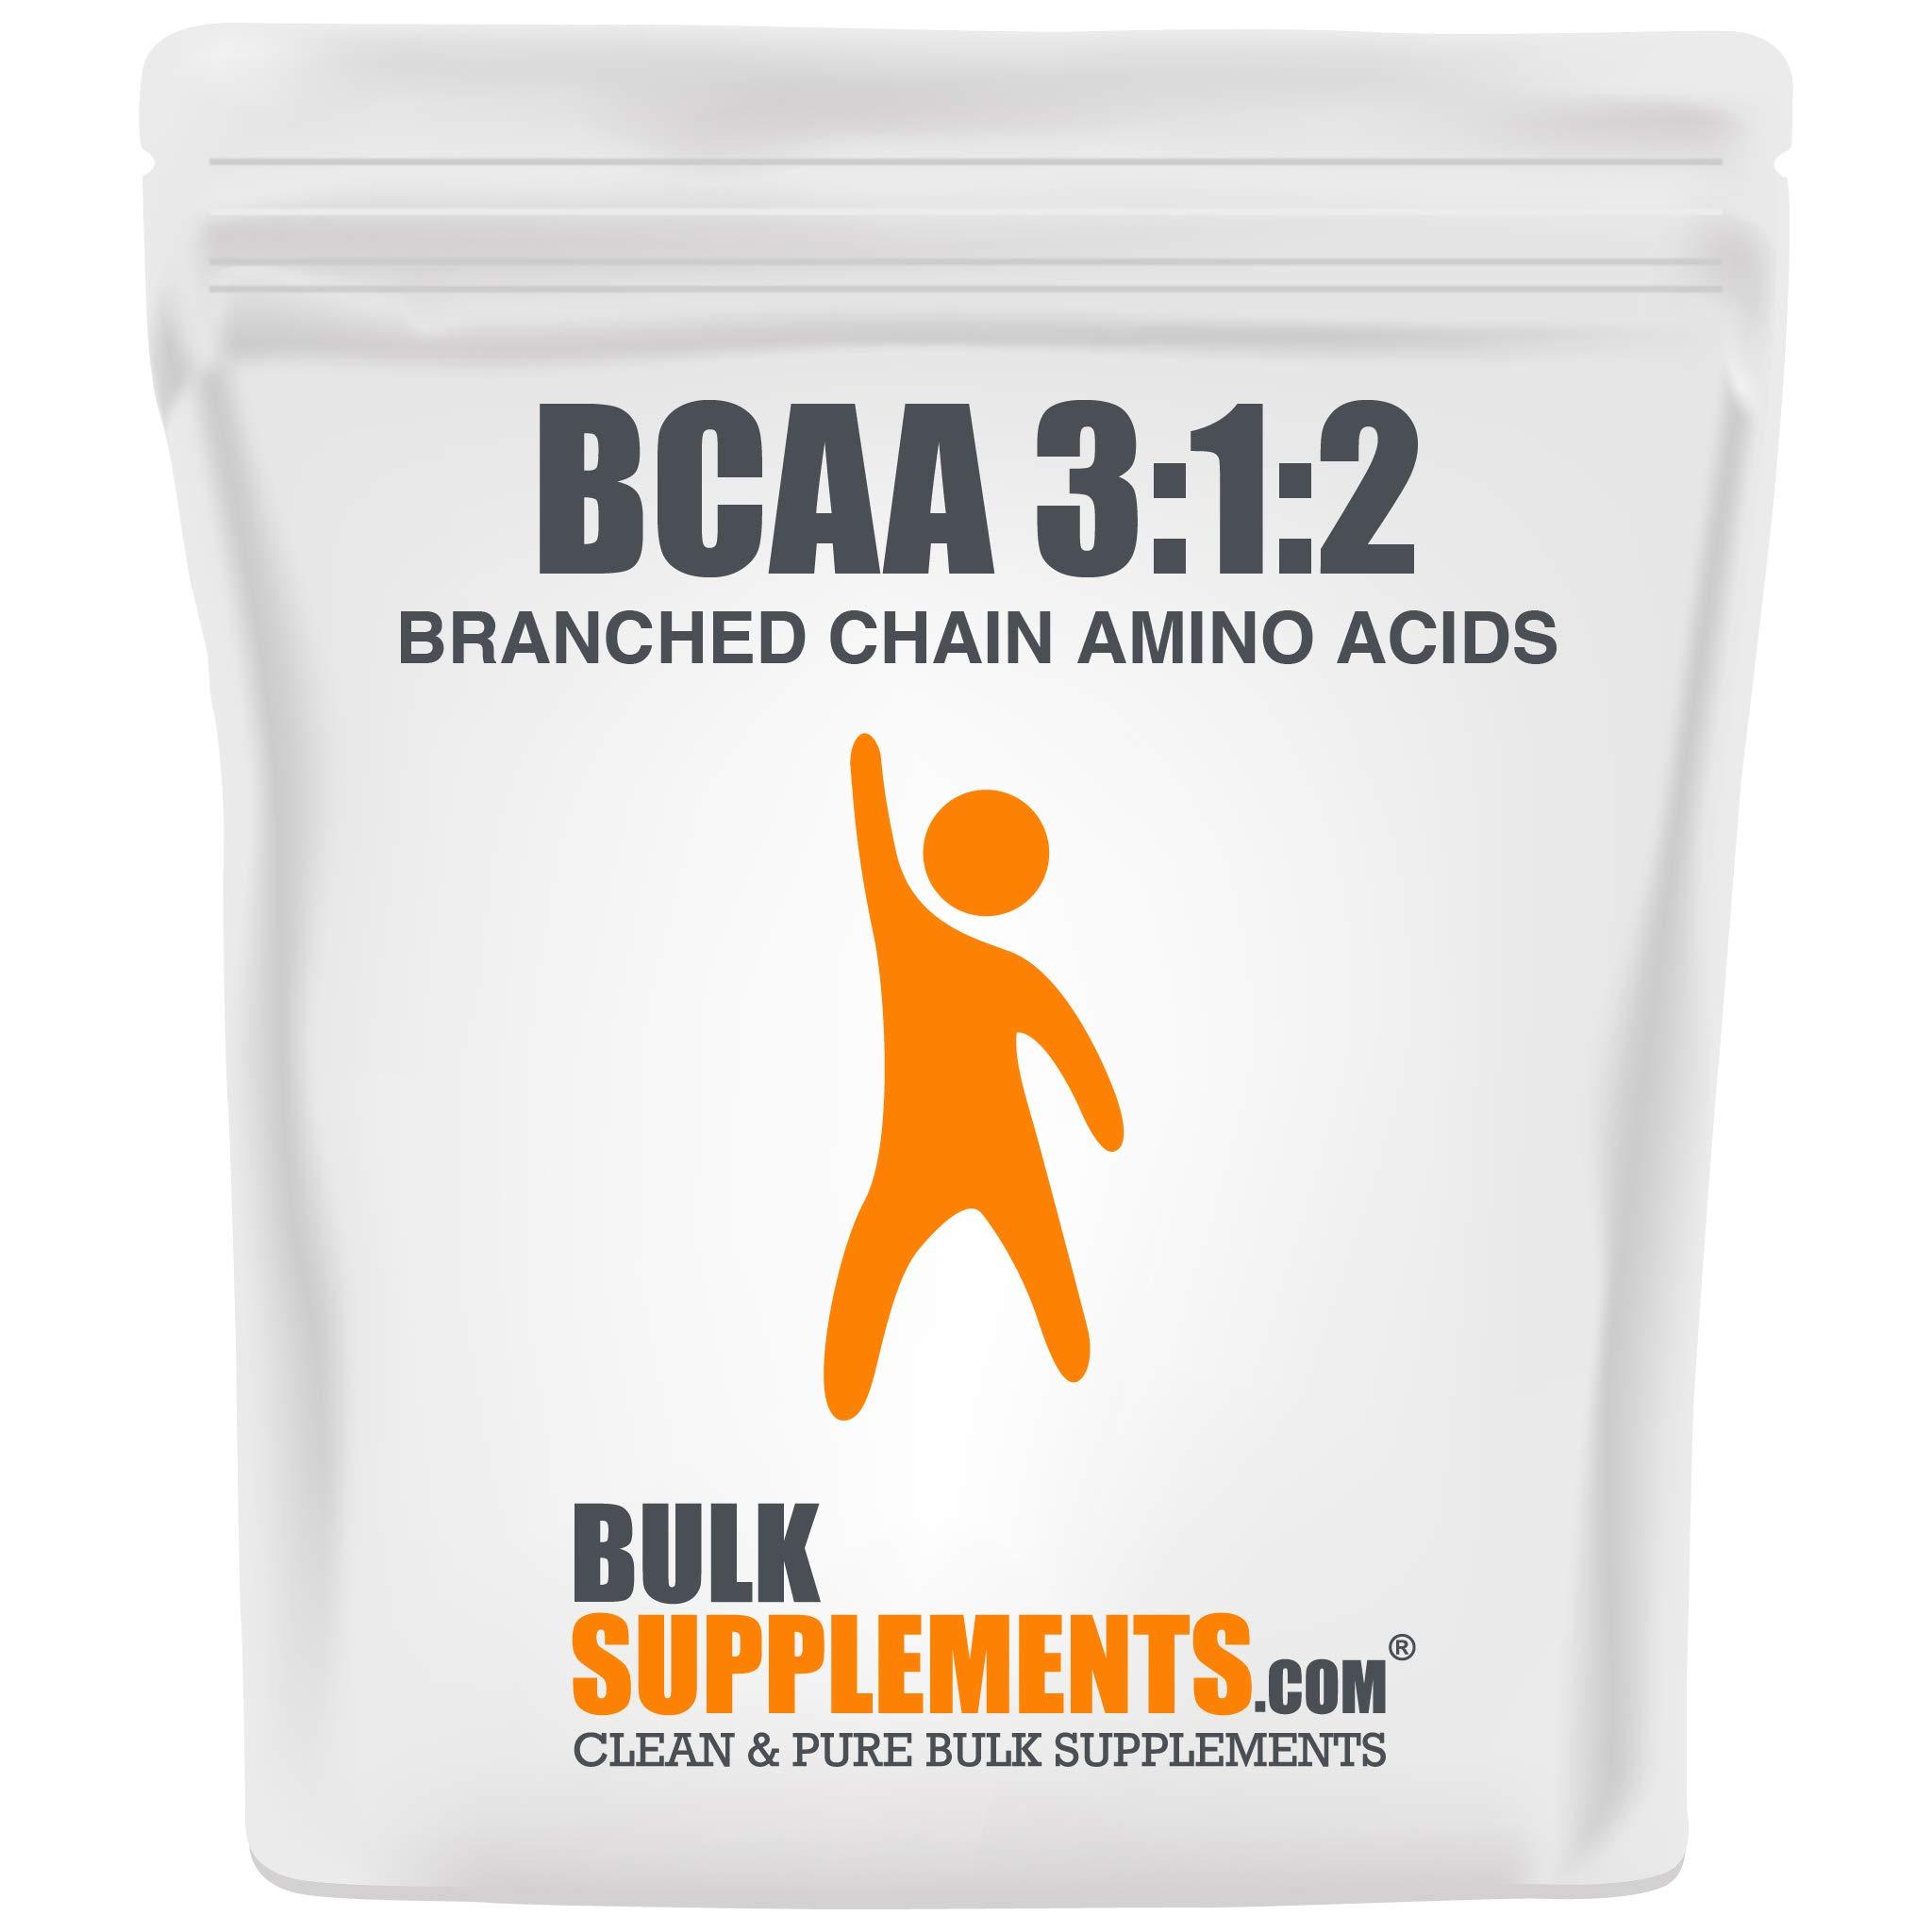 Bulksupplements BCAA 3:1:2 (Branched Chain Amino Acids) Powder (1 Kilogram)